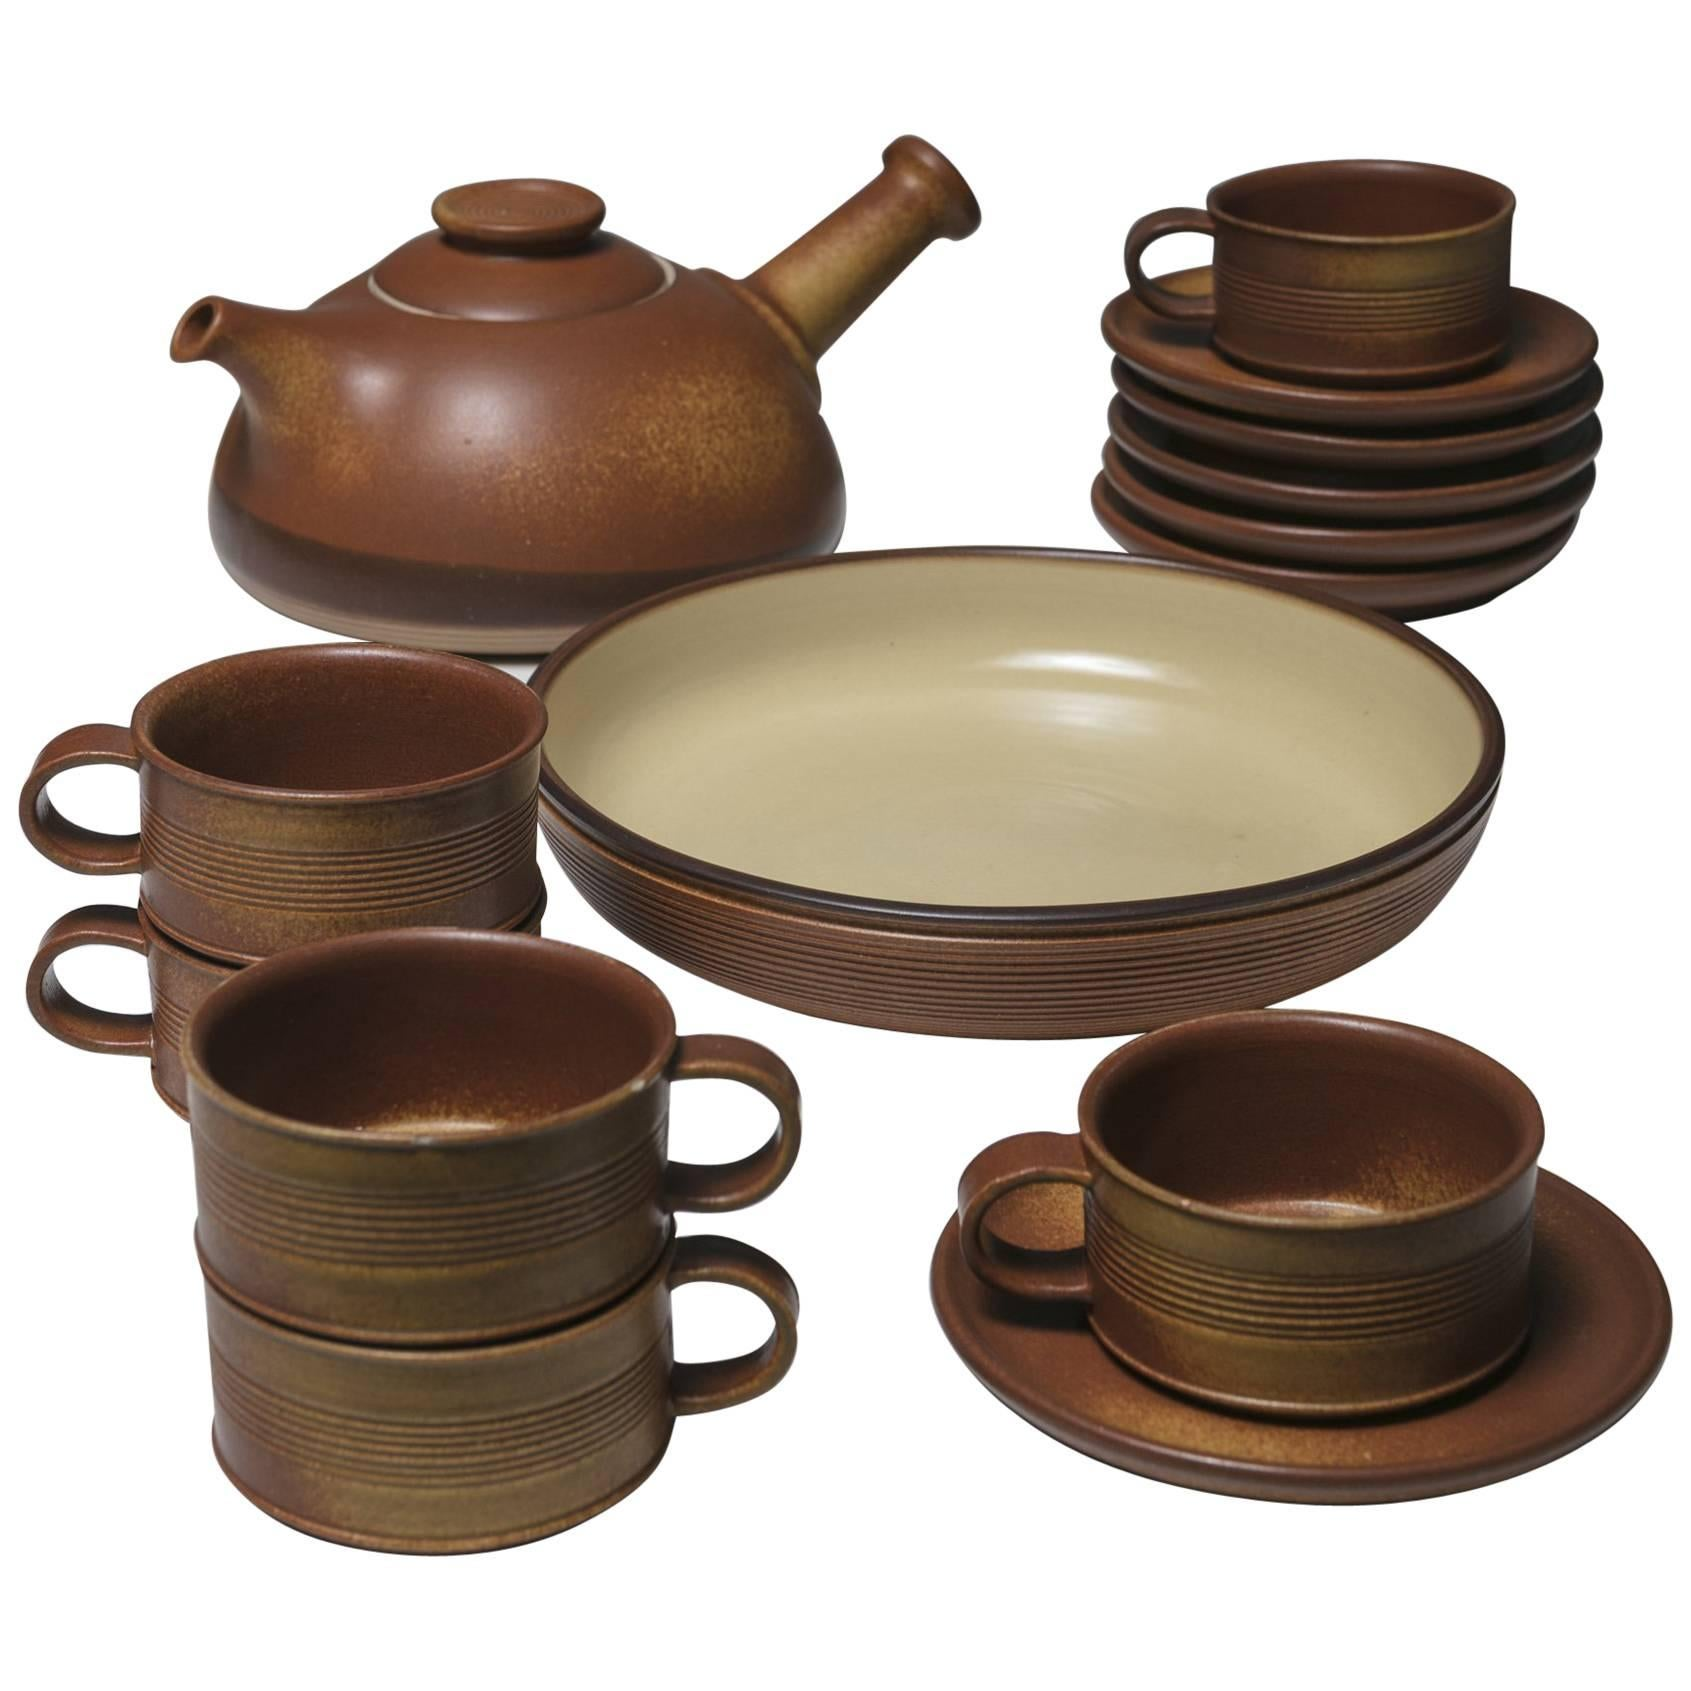 Ceramic Tea Set by Franco Bucci for Laboratorio Pesaro